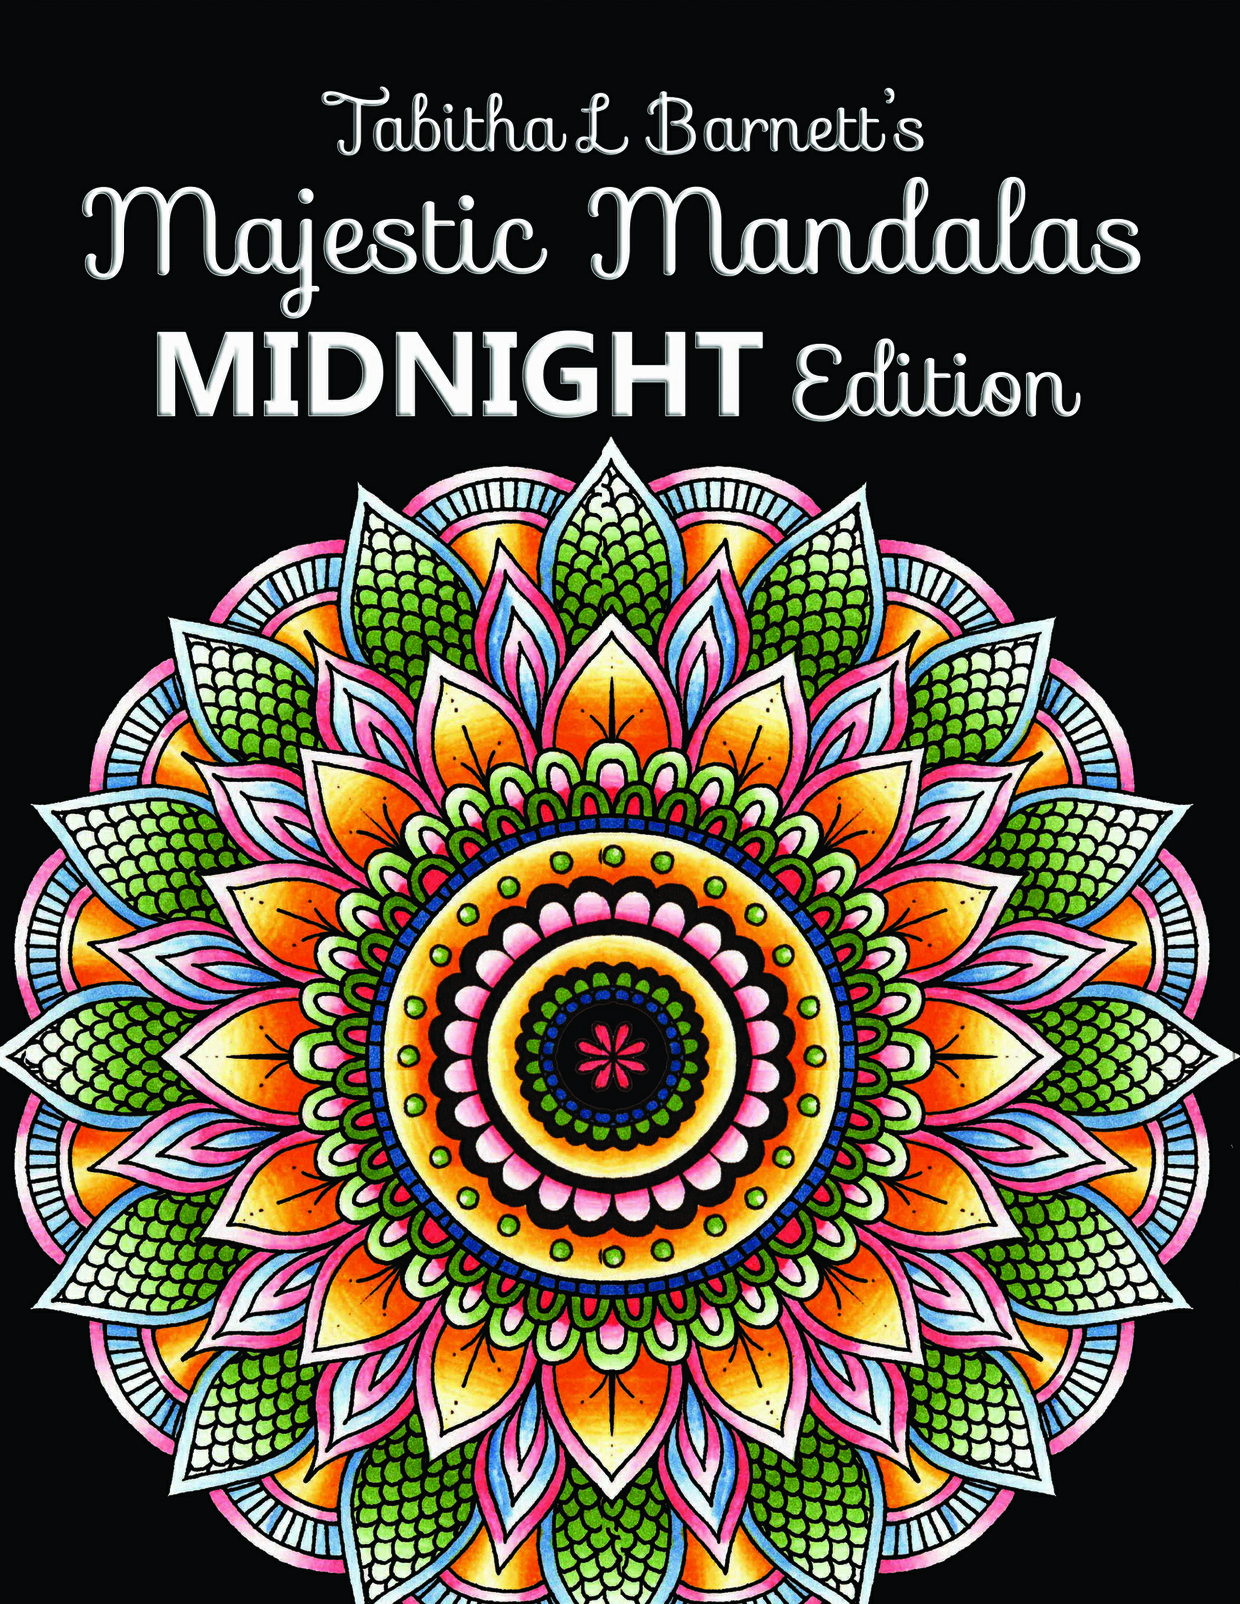 Majestic Mandalas MIDNIGHT Edition PDF